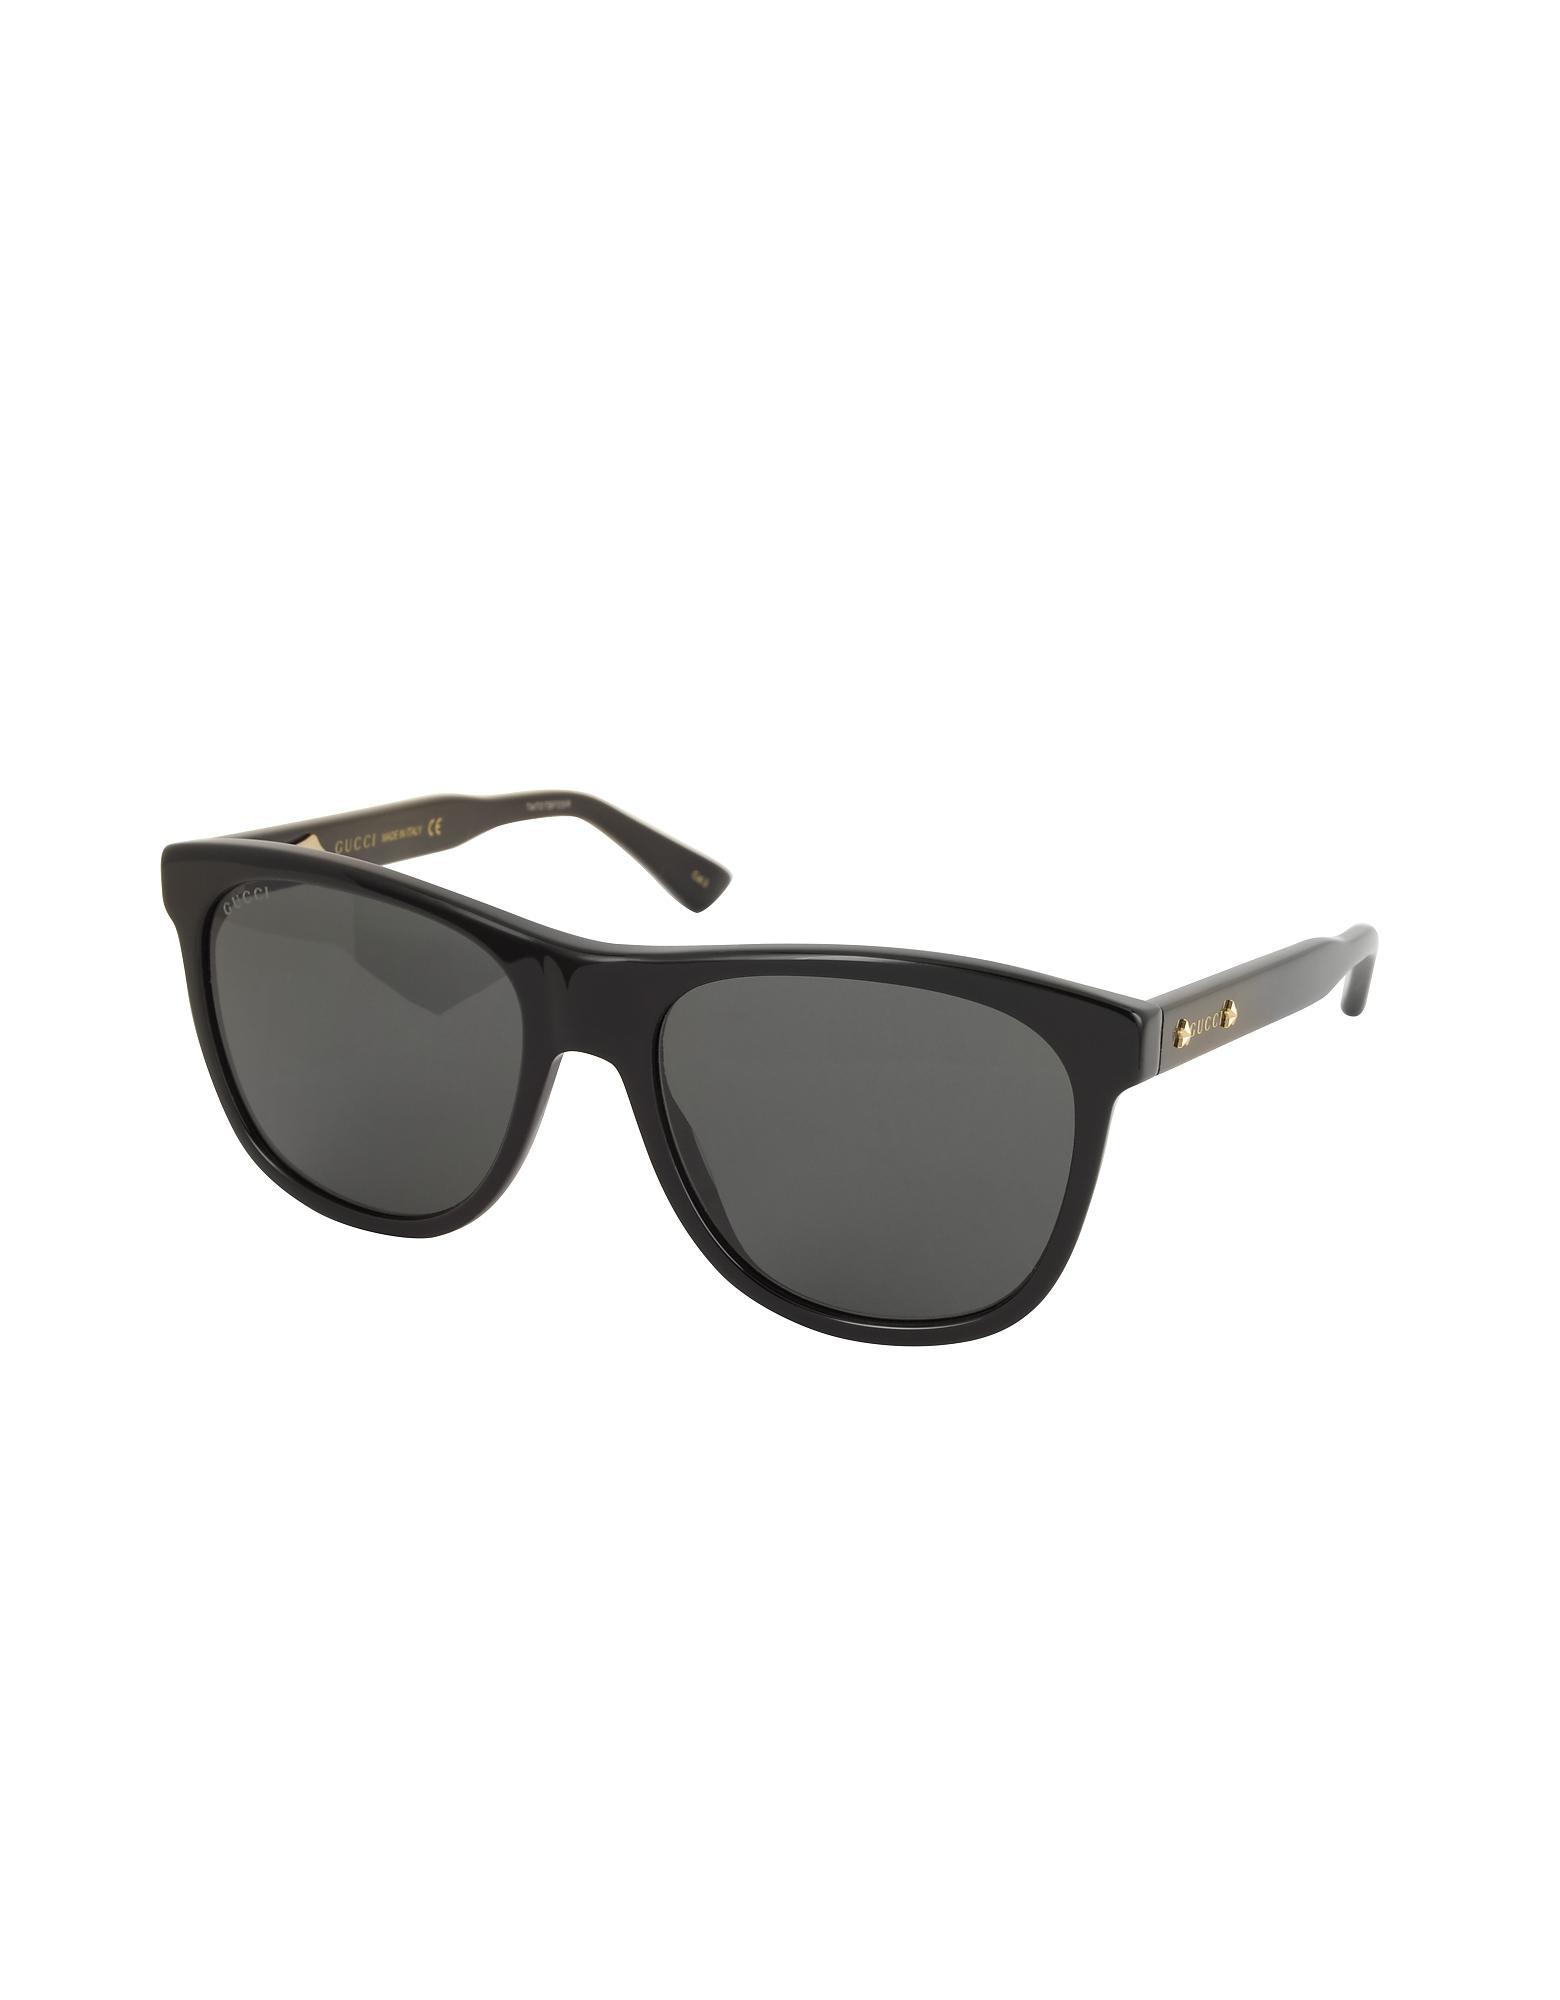 590a32903e Gucci GG0266S Squared-frame Black Sunglasses W polarized Lenses in Black  for Men - Lyst